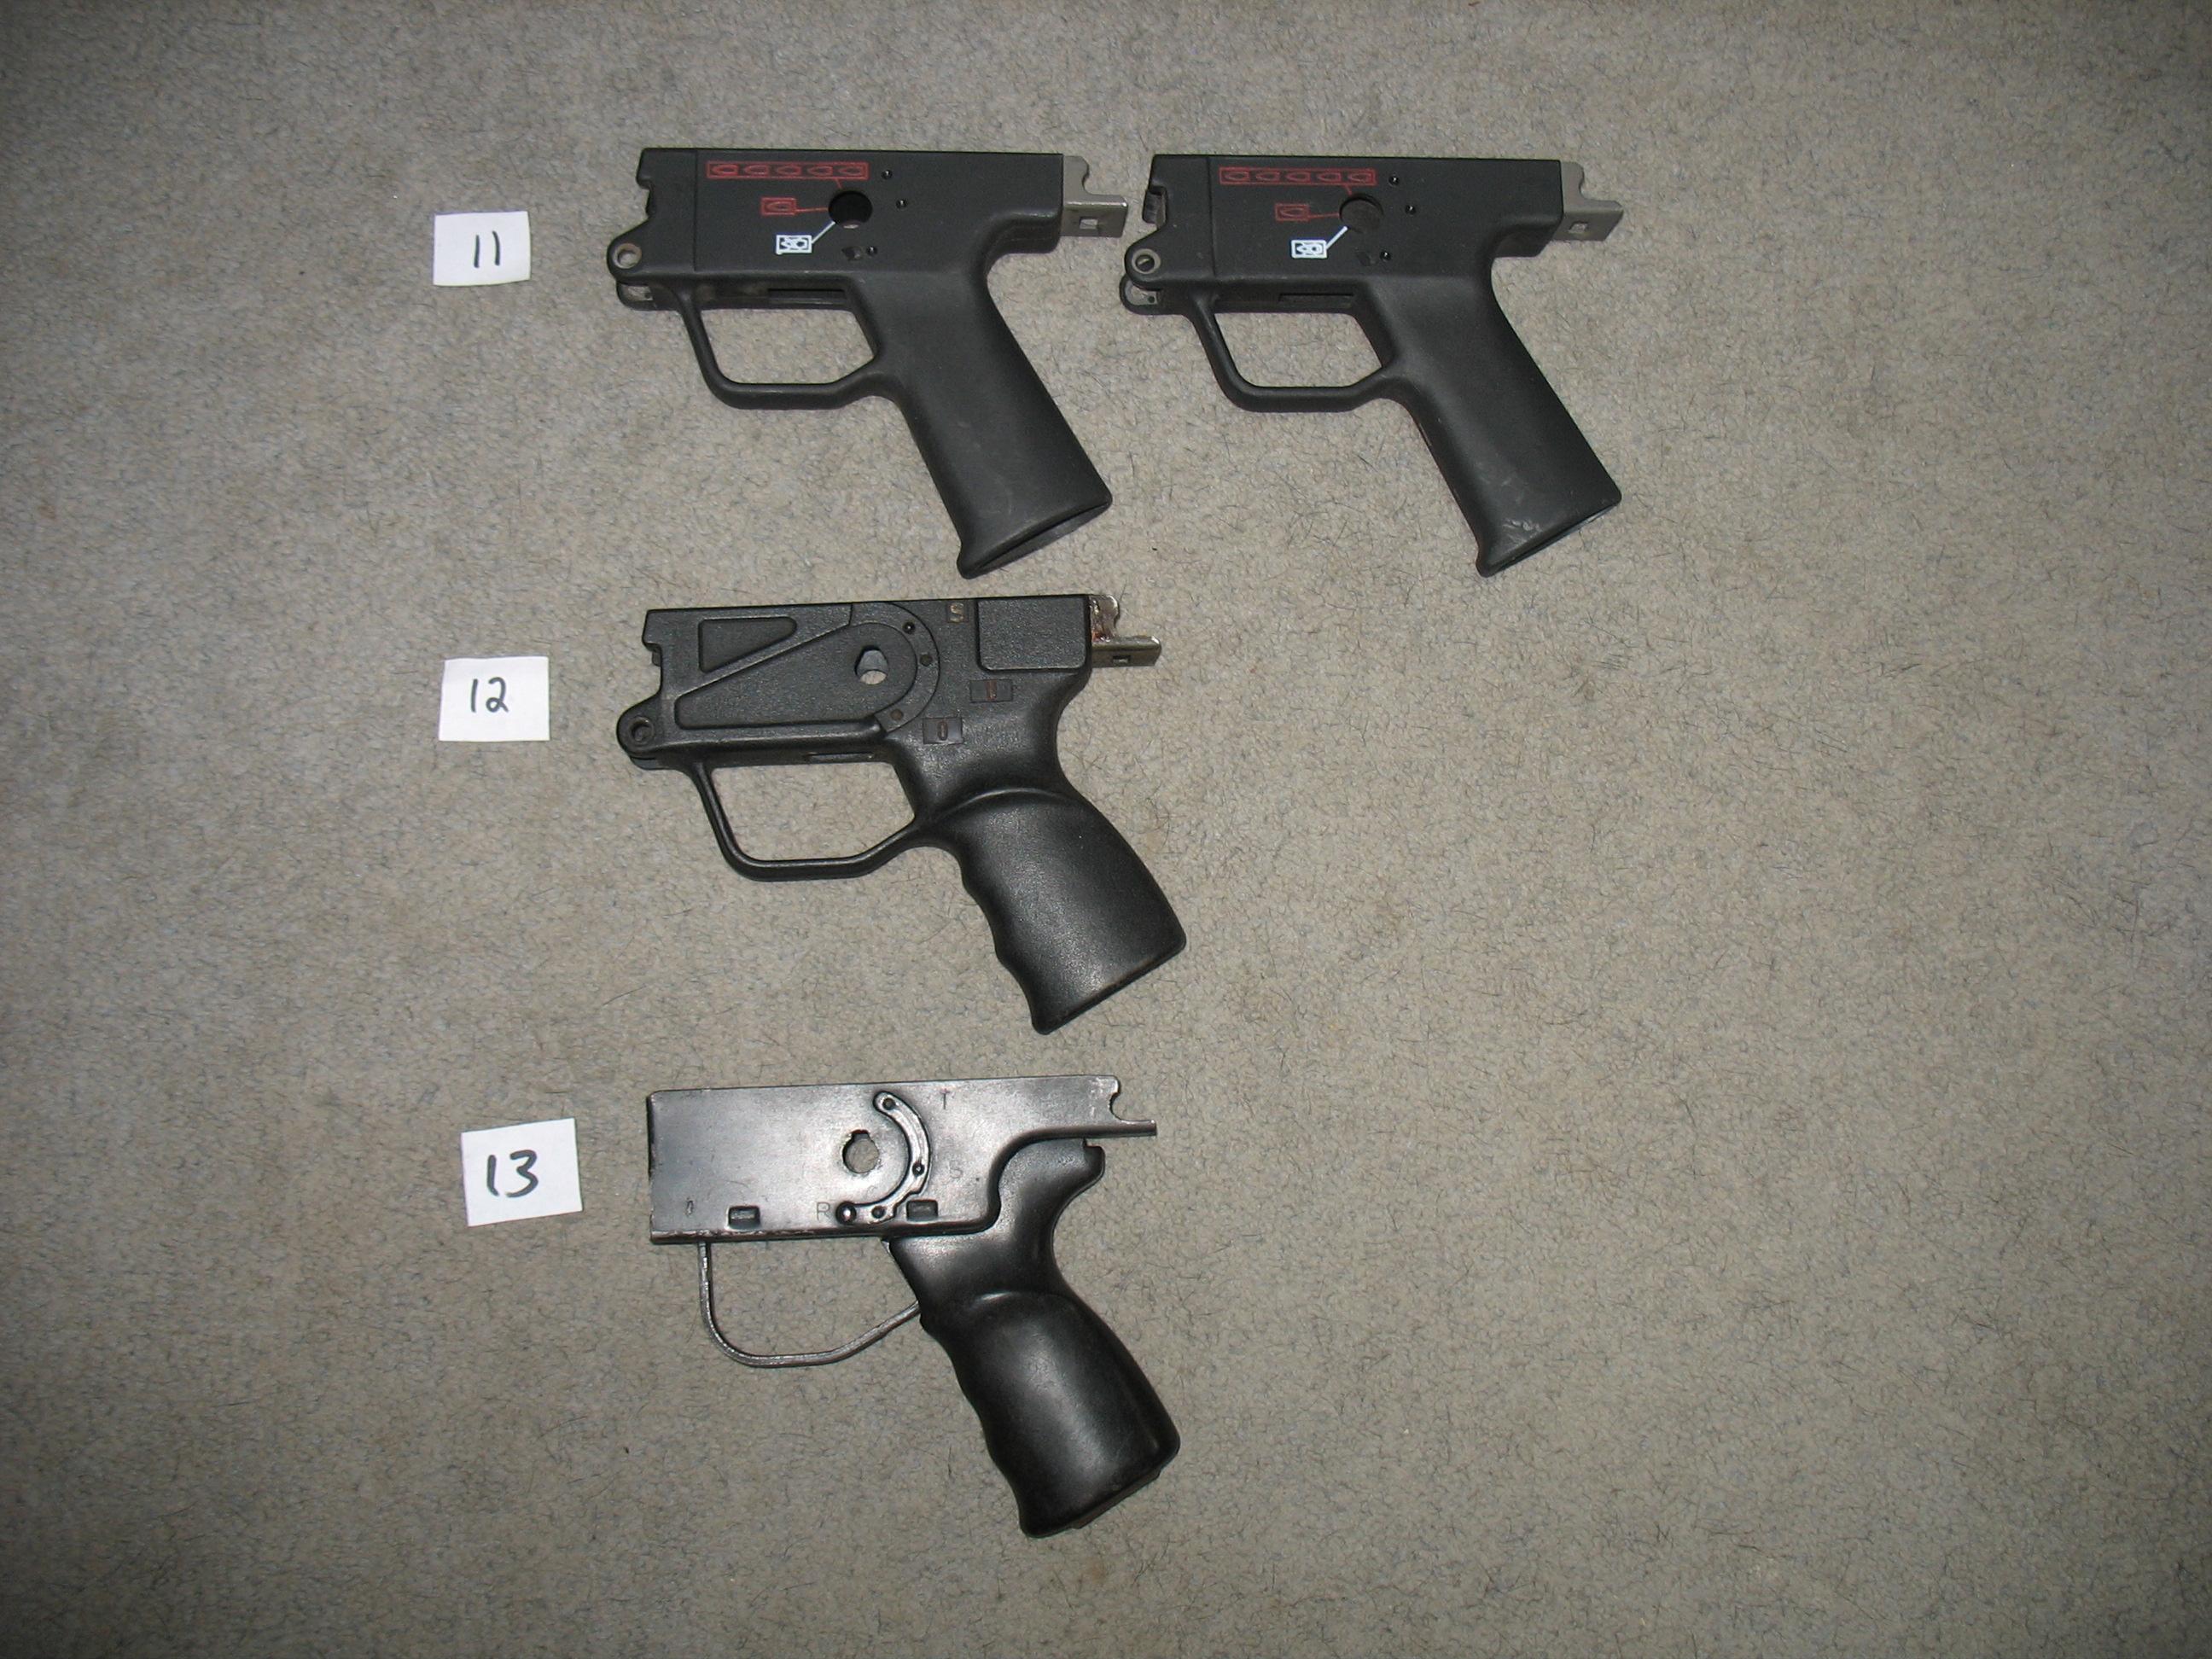 Wts Parts For Ump Mp5 Hk94 Mp5k Sp89 91 G3 Usp